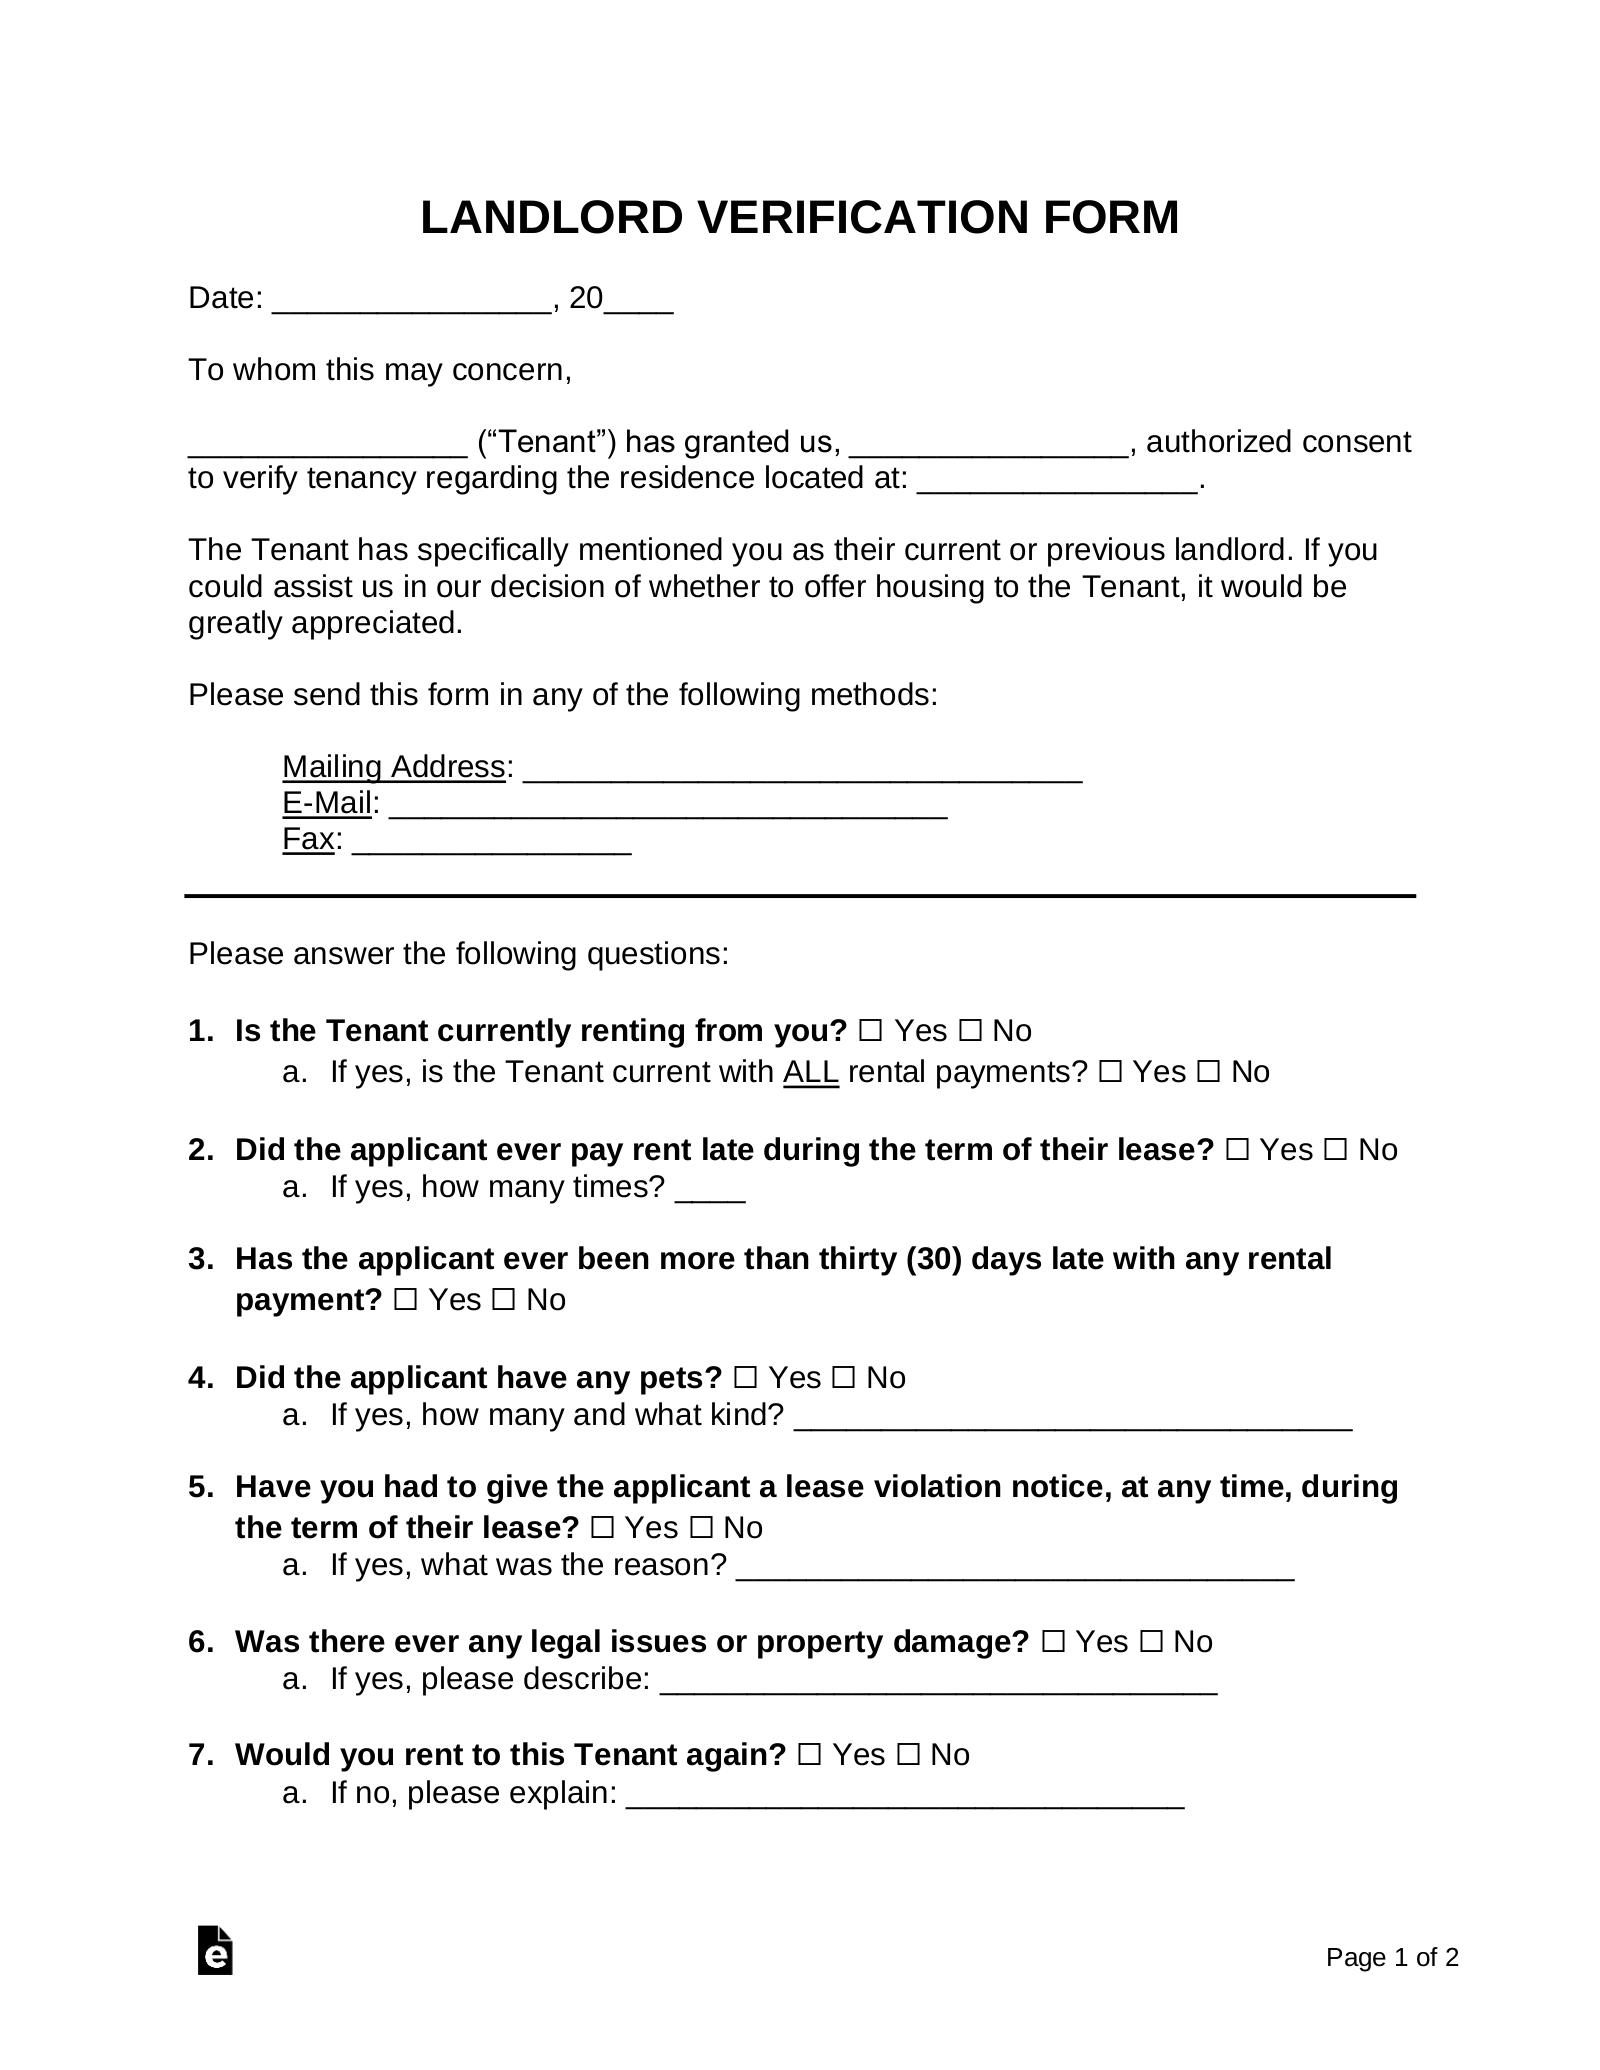 Free Rent Landlord Verification Form Pdf Word Eforms